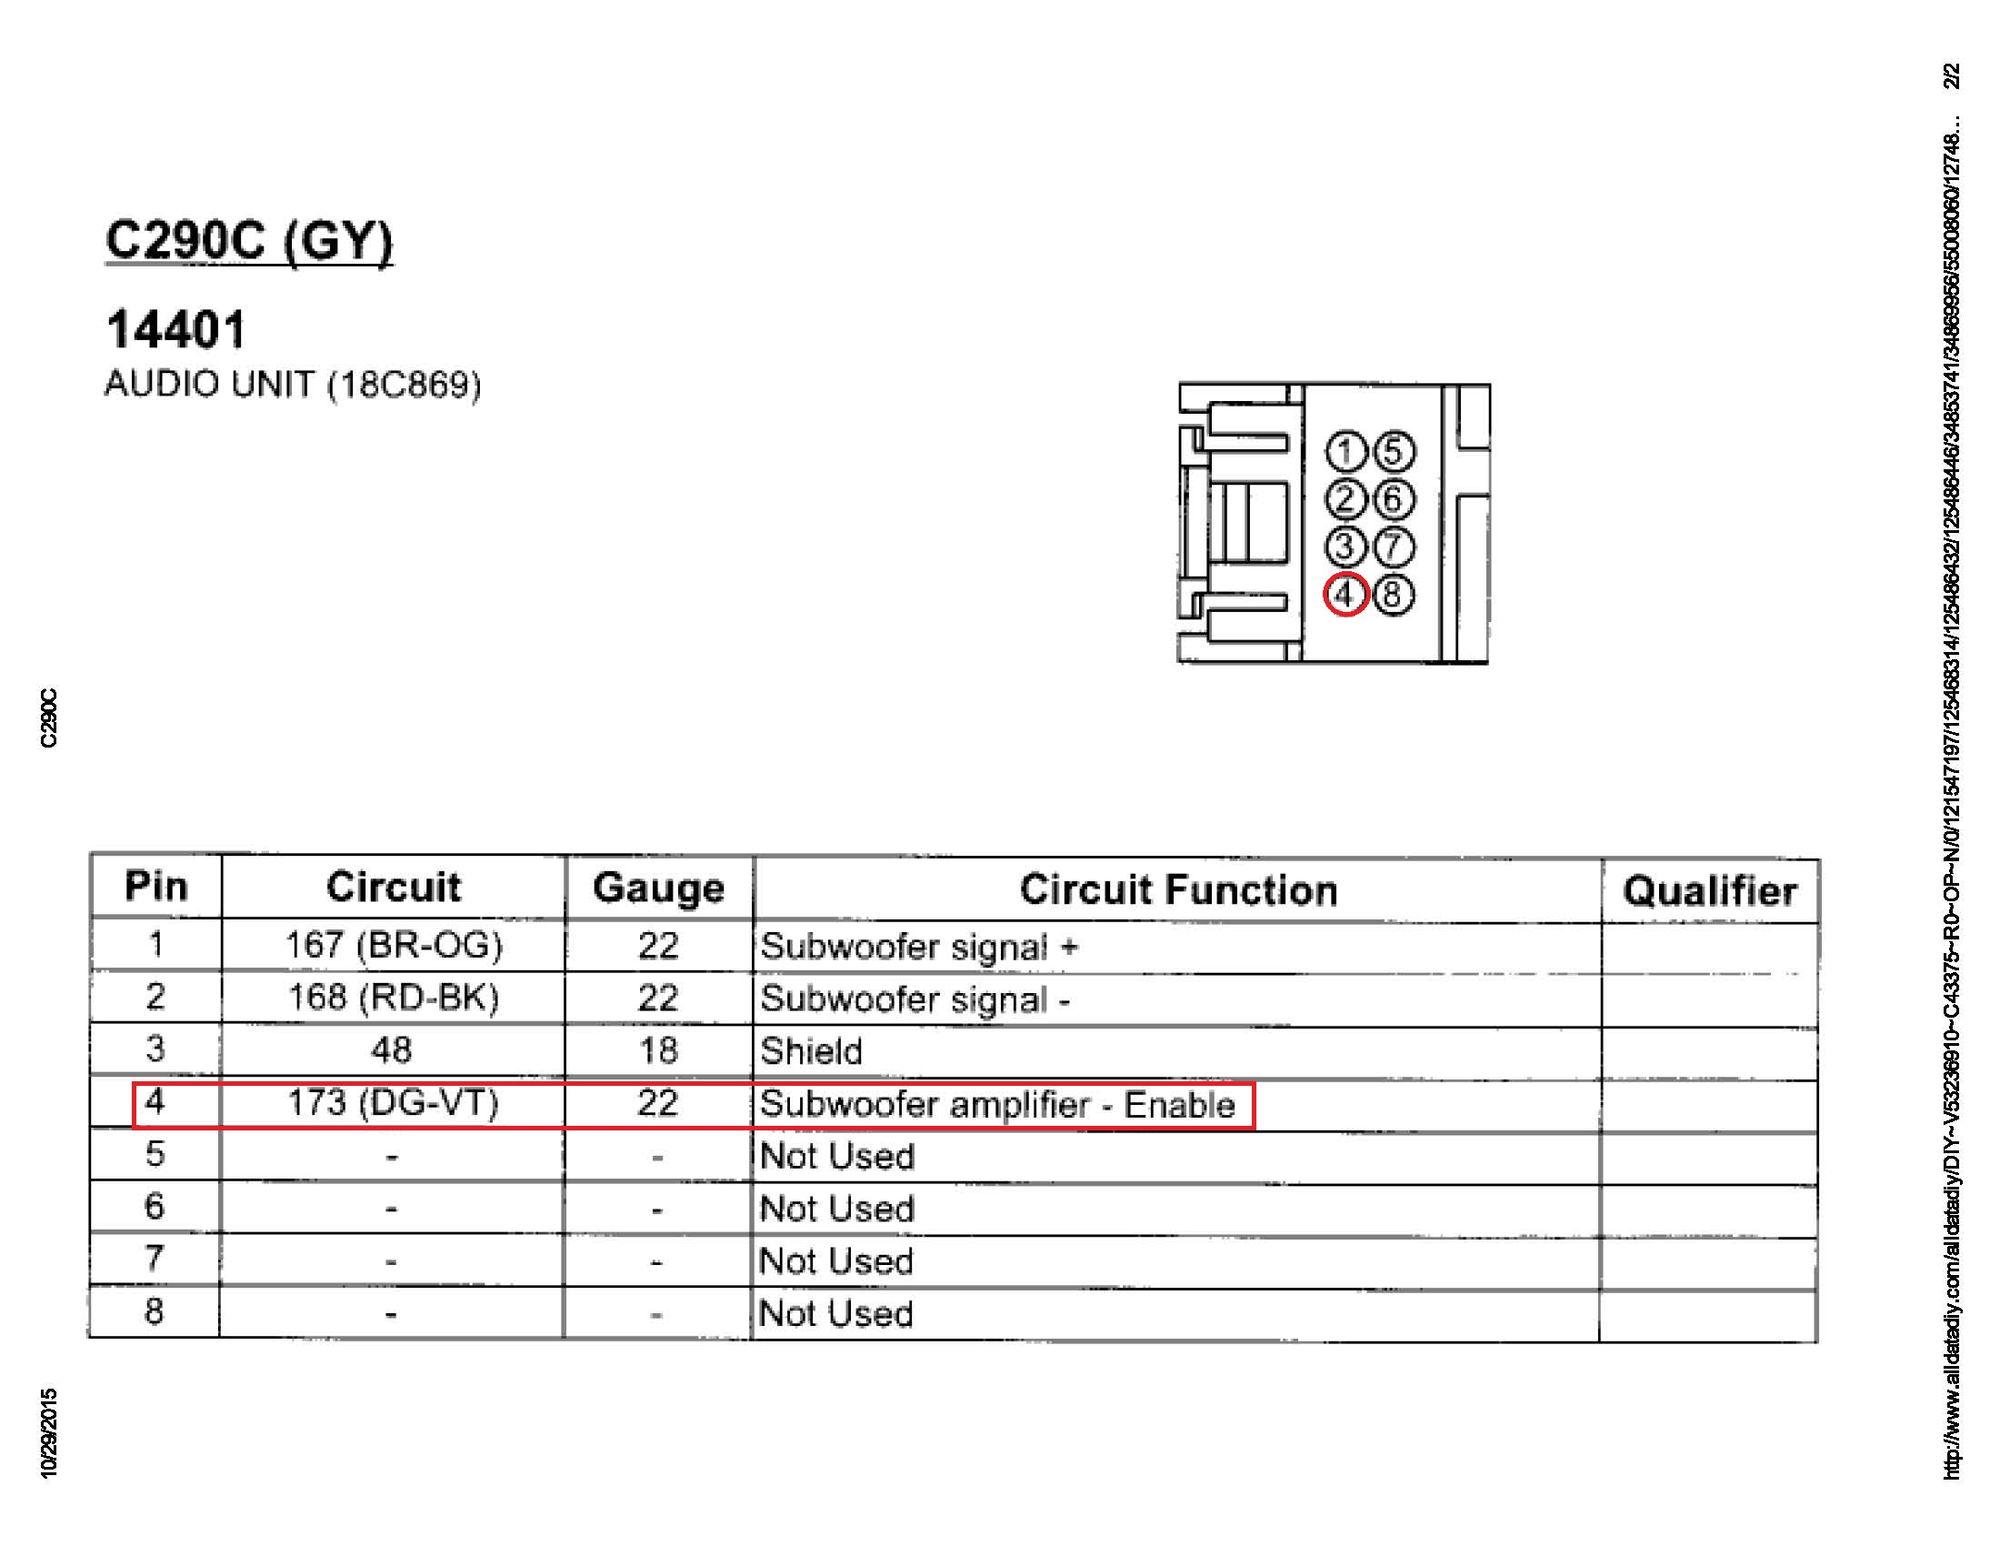 80 c290c_subplghu_d85ed382328ff6386a3184654777ba4d6b199319?resize=665%2C514&ssl=1 metra 70 5521 wiring diagram metra wiring diagrams collection  at eliteediting.co